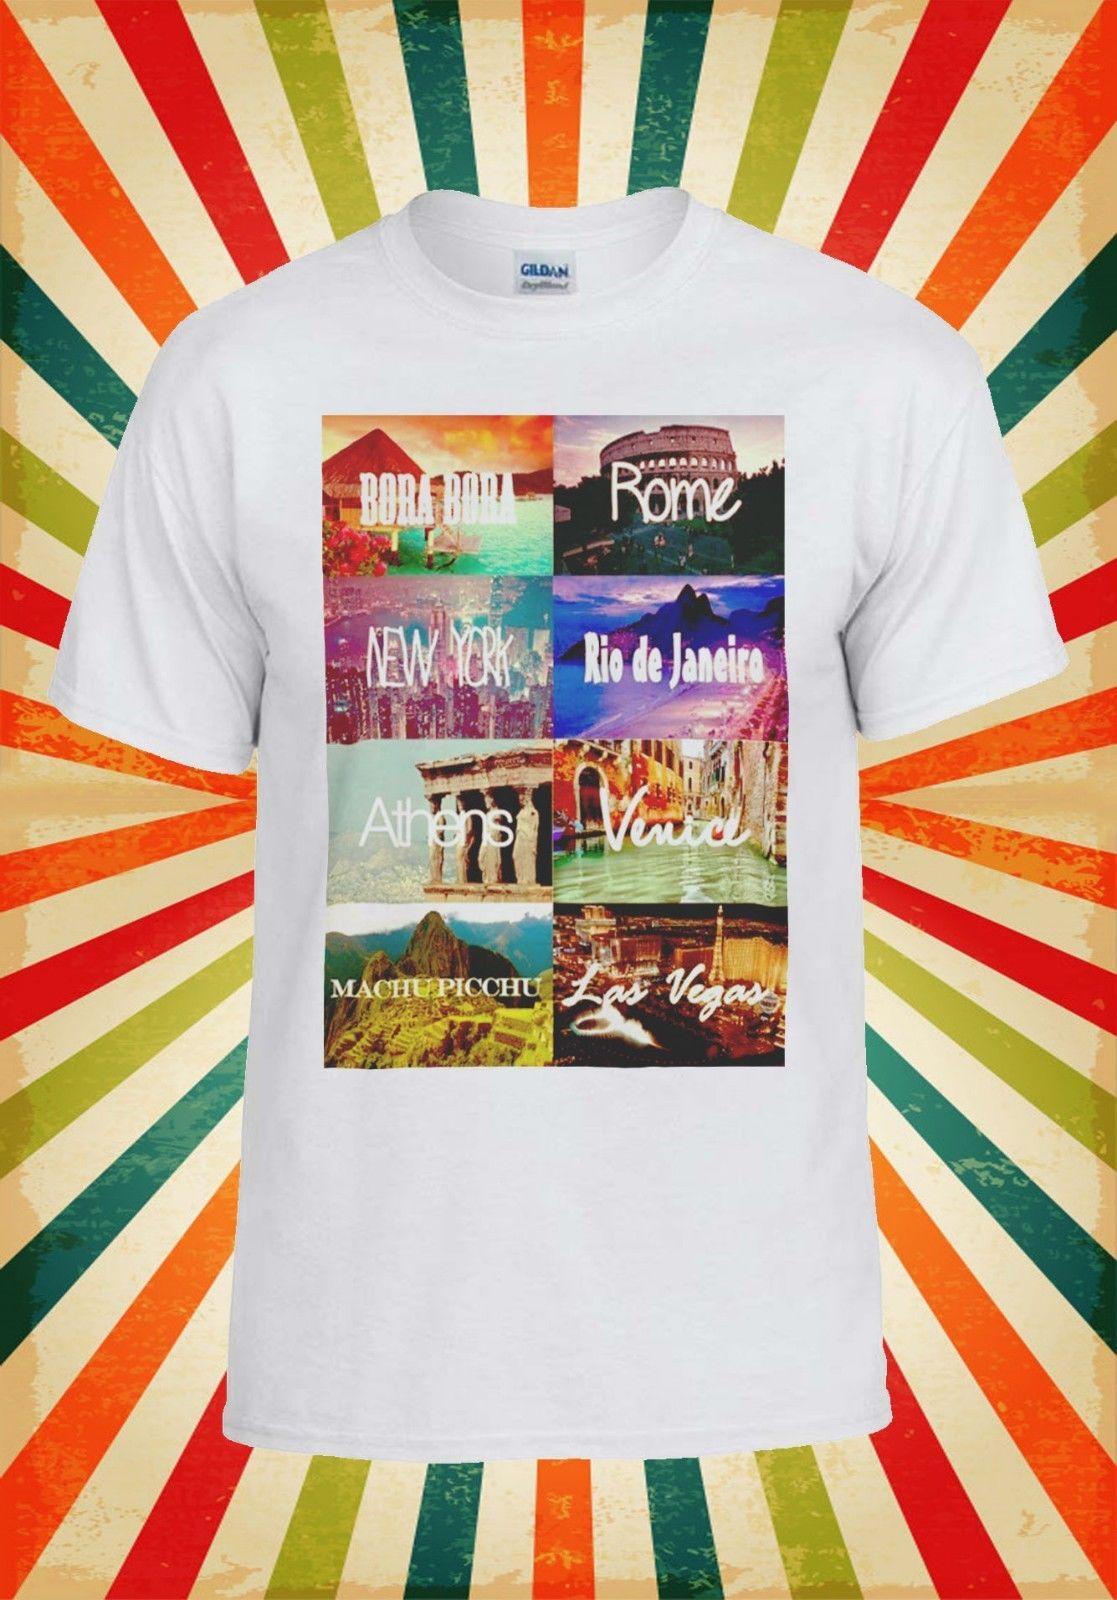 d6a8d2fc New York Las Vegas Venice Rome T Shirt 1044 Funny 100 Cotton T Shirt  Harajuku Summer